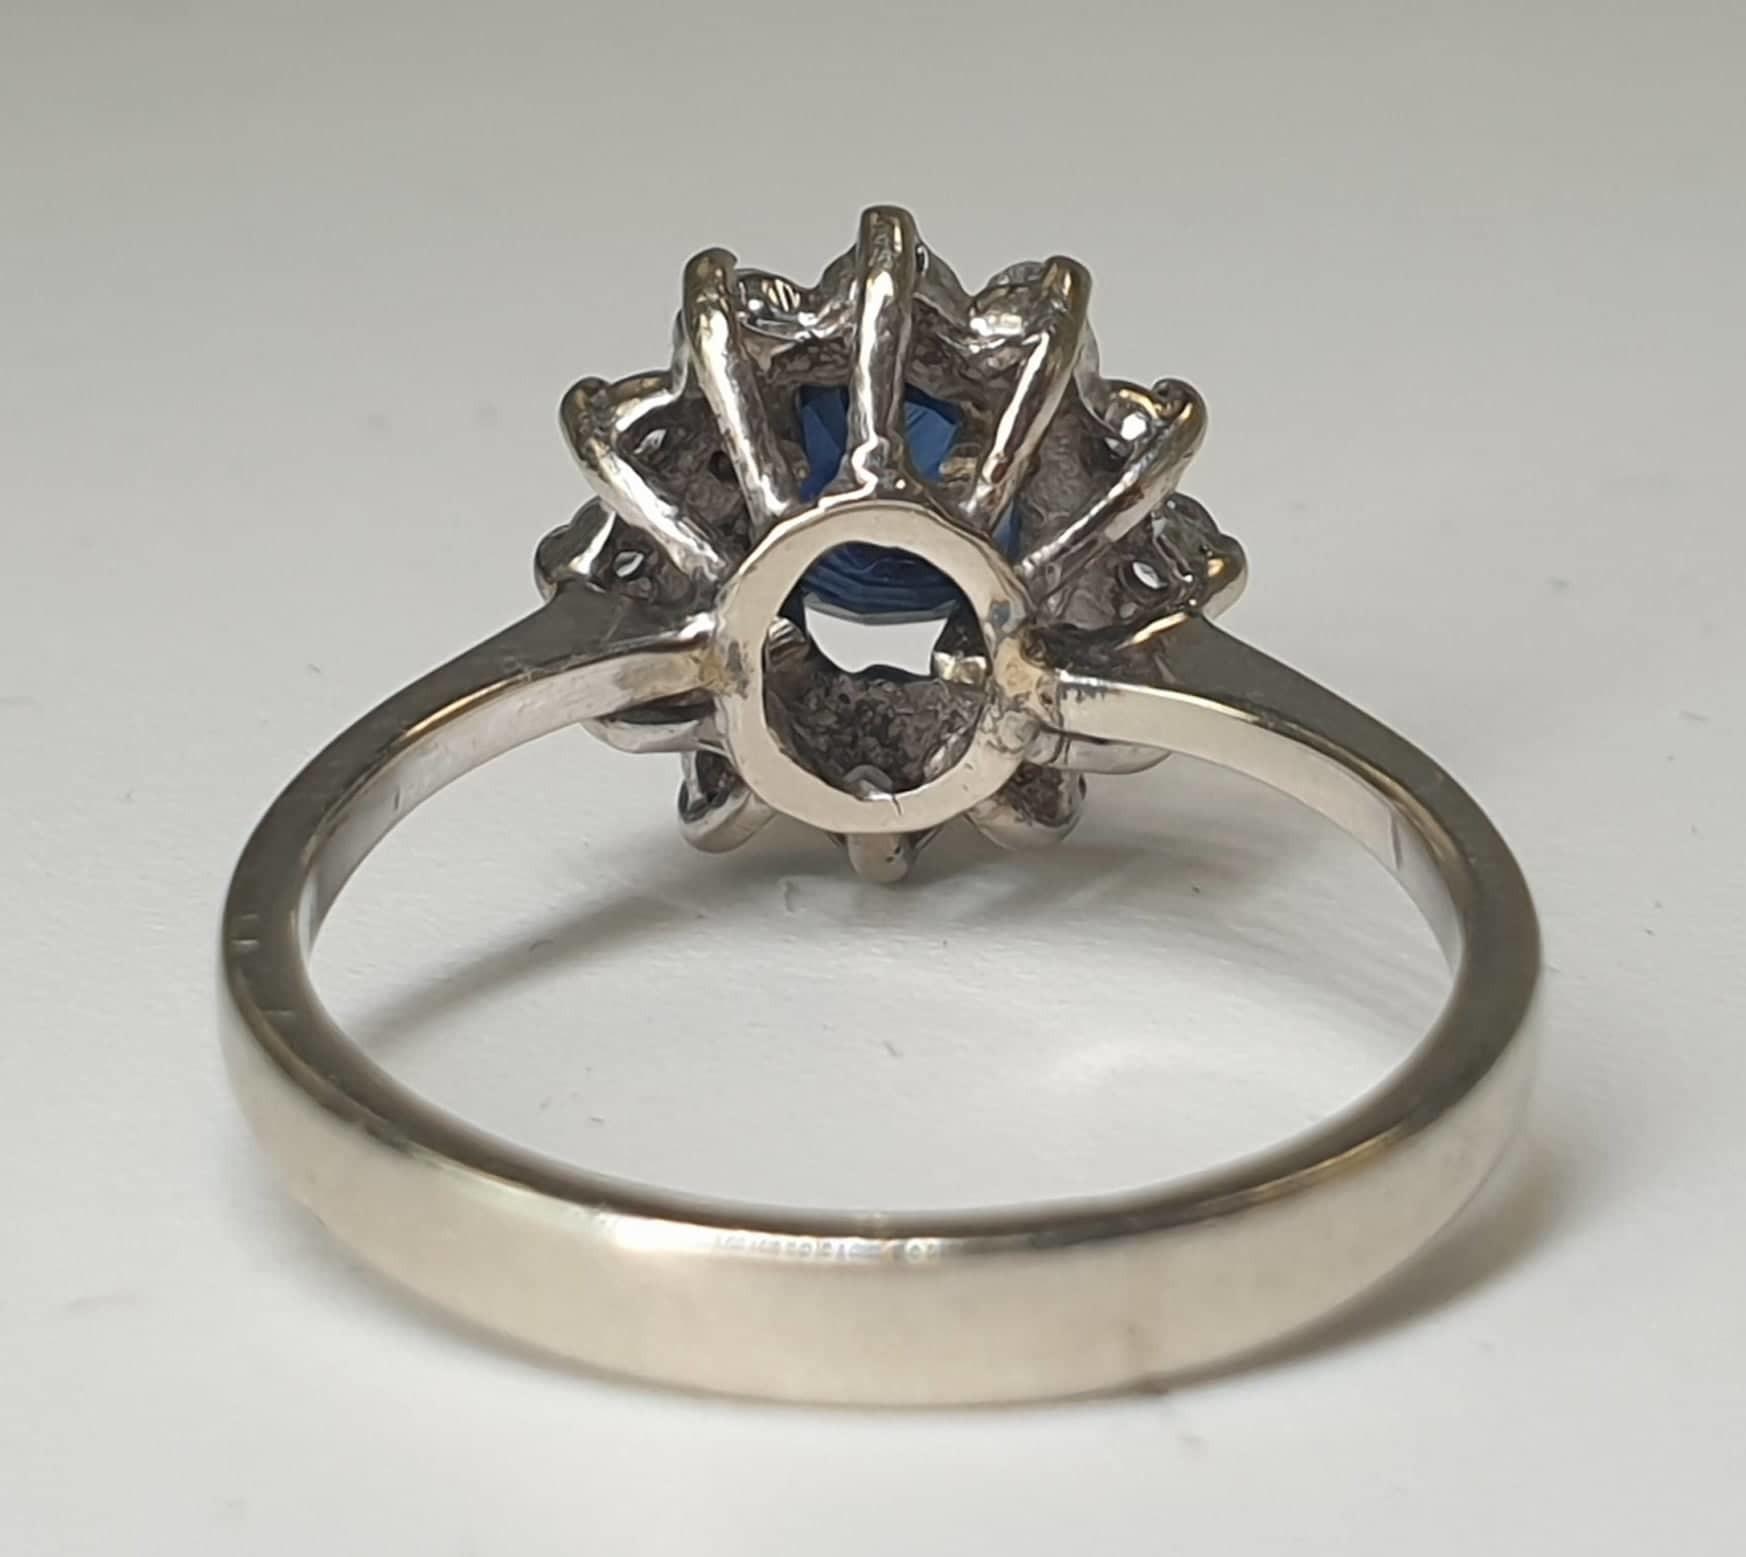 Diamond & Sapphire Ring | 14K White Gold - Image 5 of 5